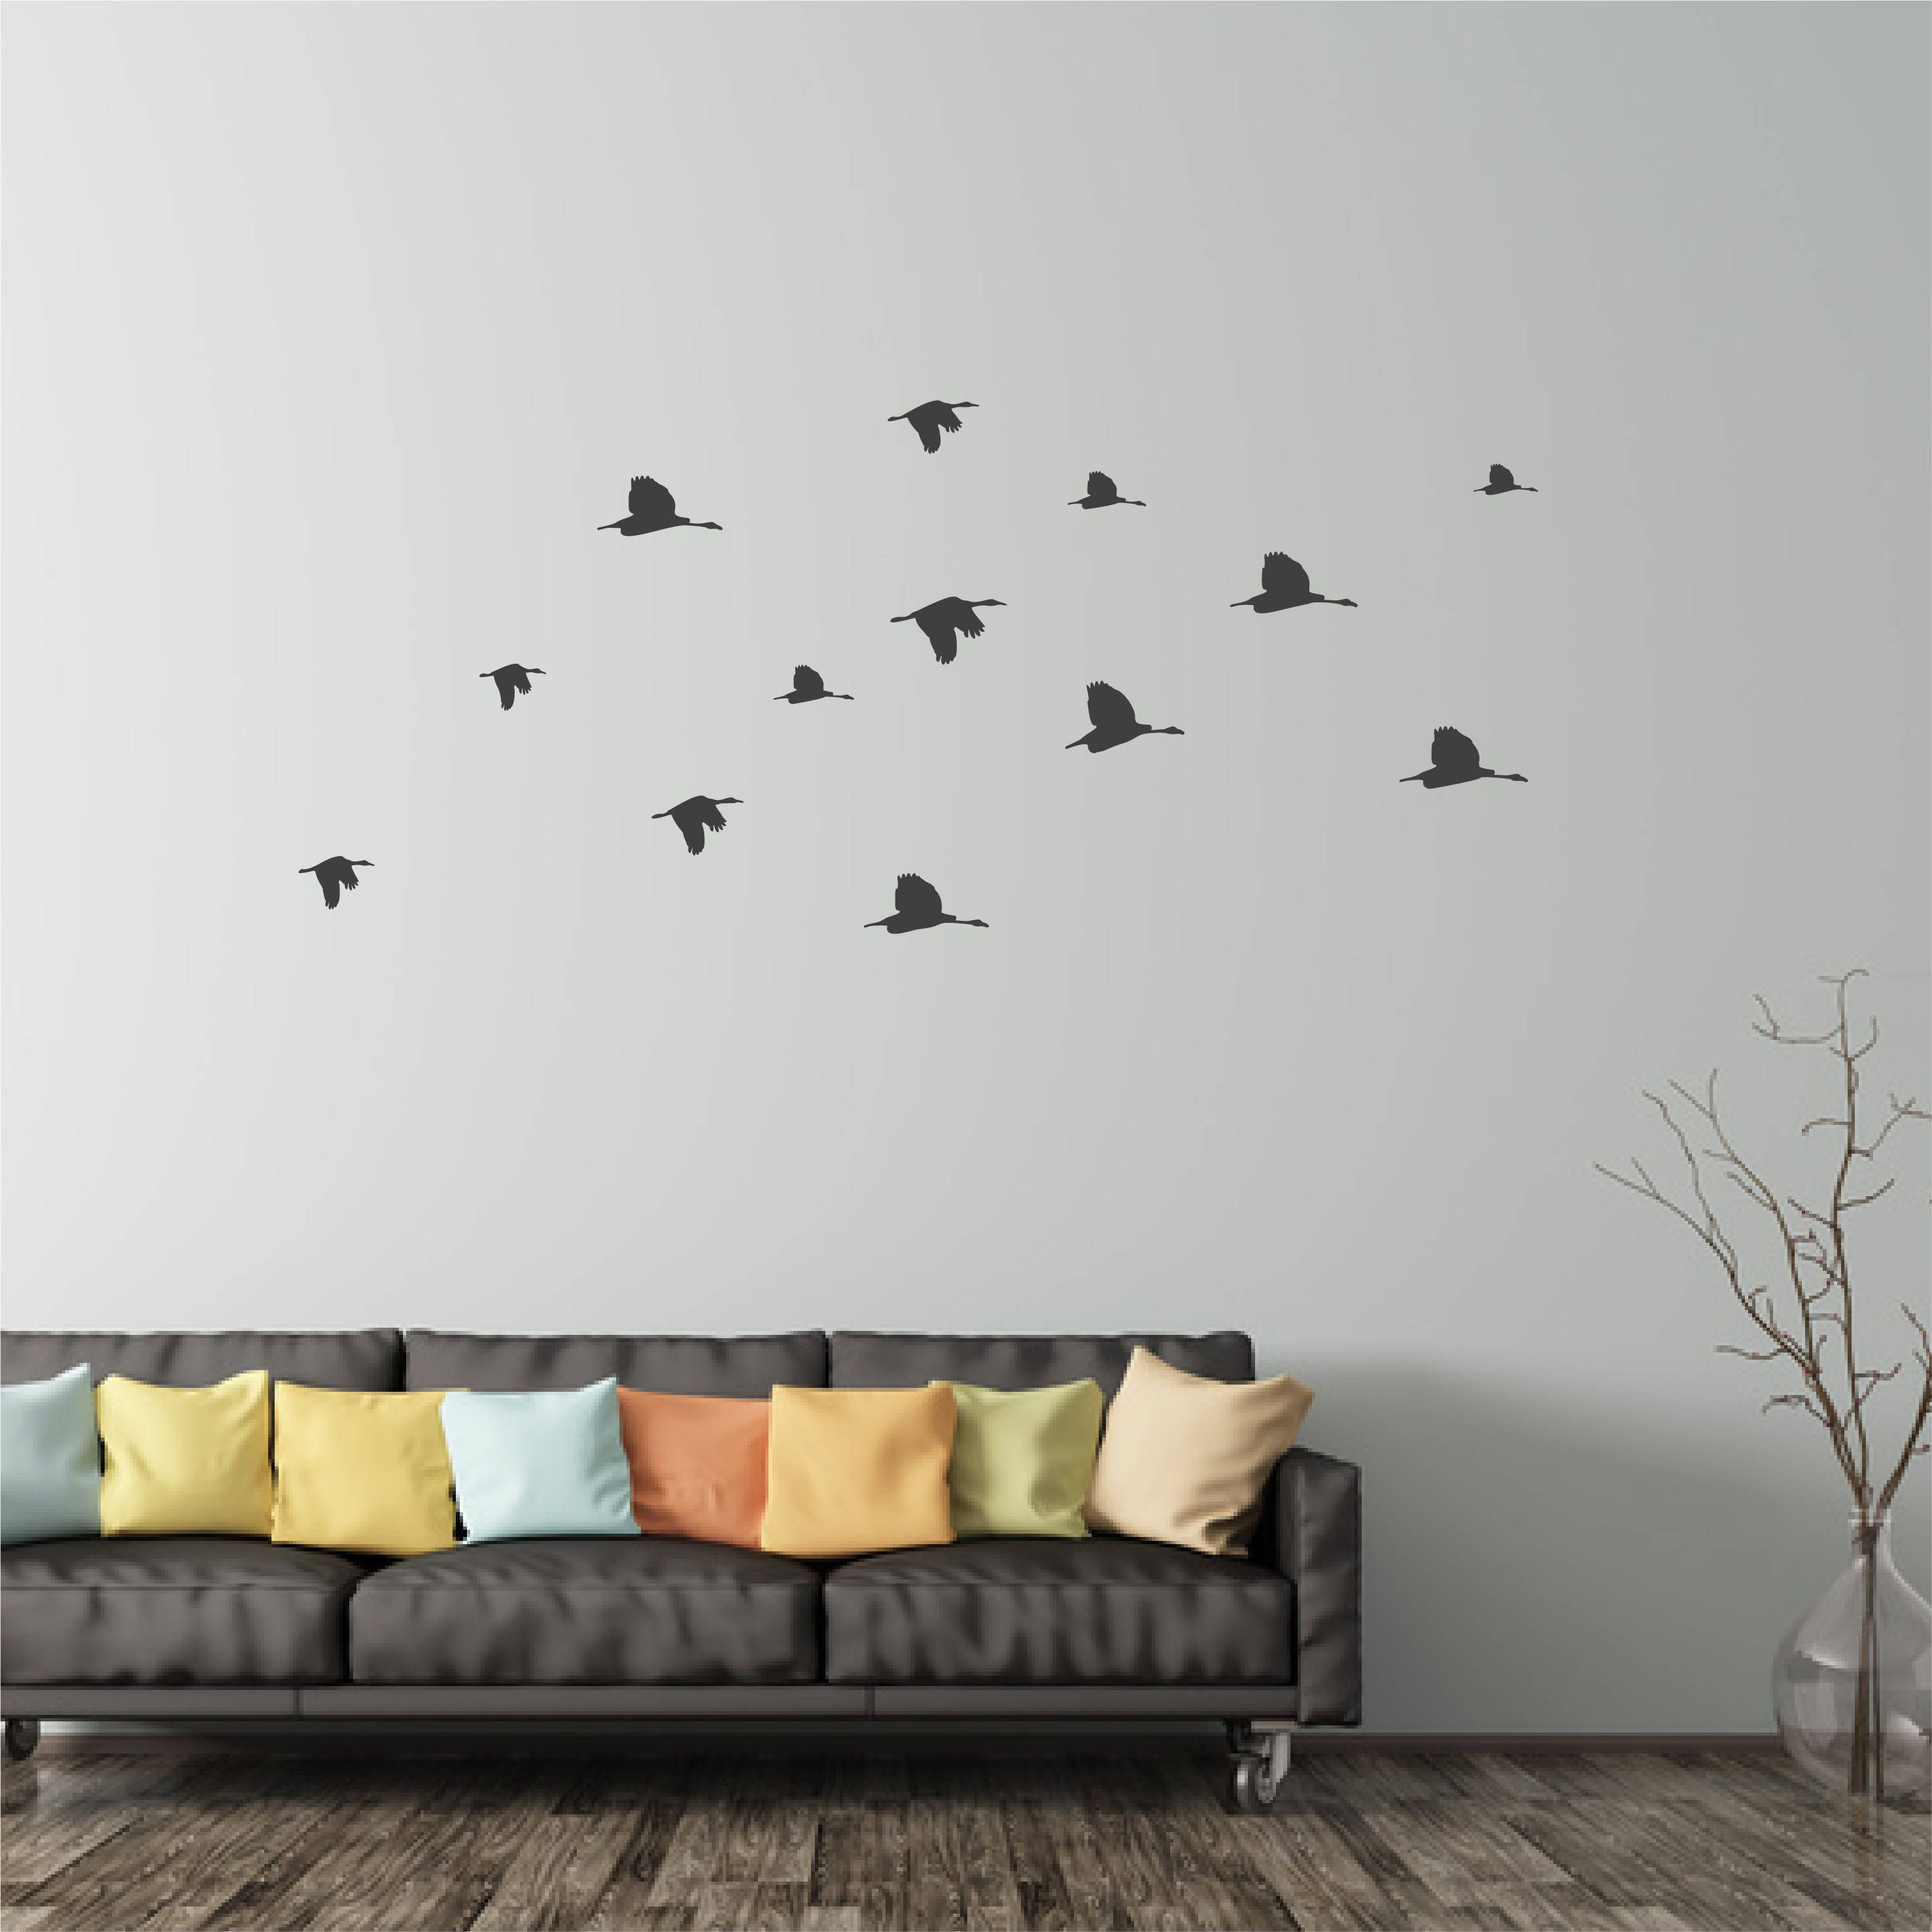 Flock Of Flying Birds Wall Sticker Peel And Stick Wall Decals Bird ...